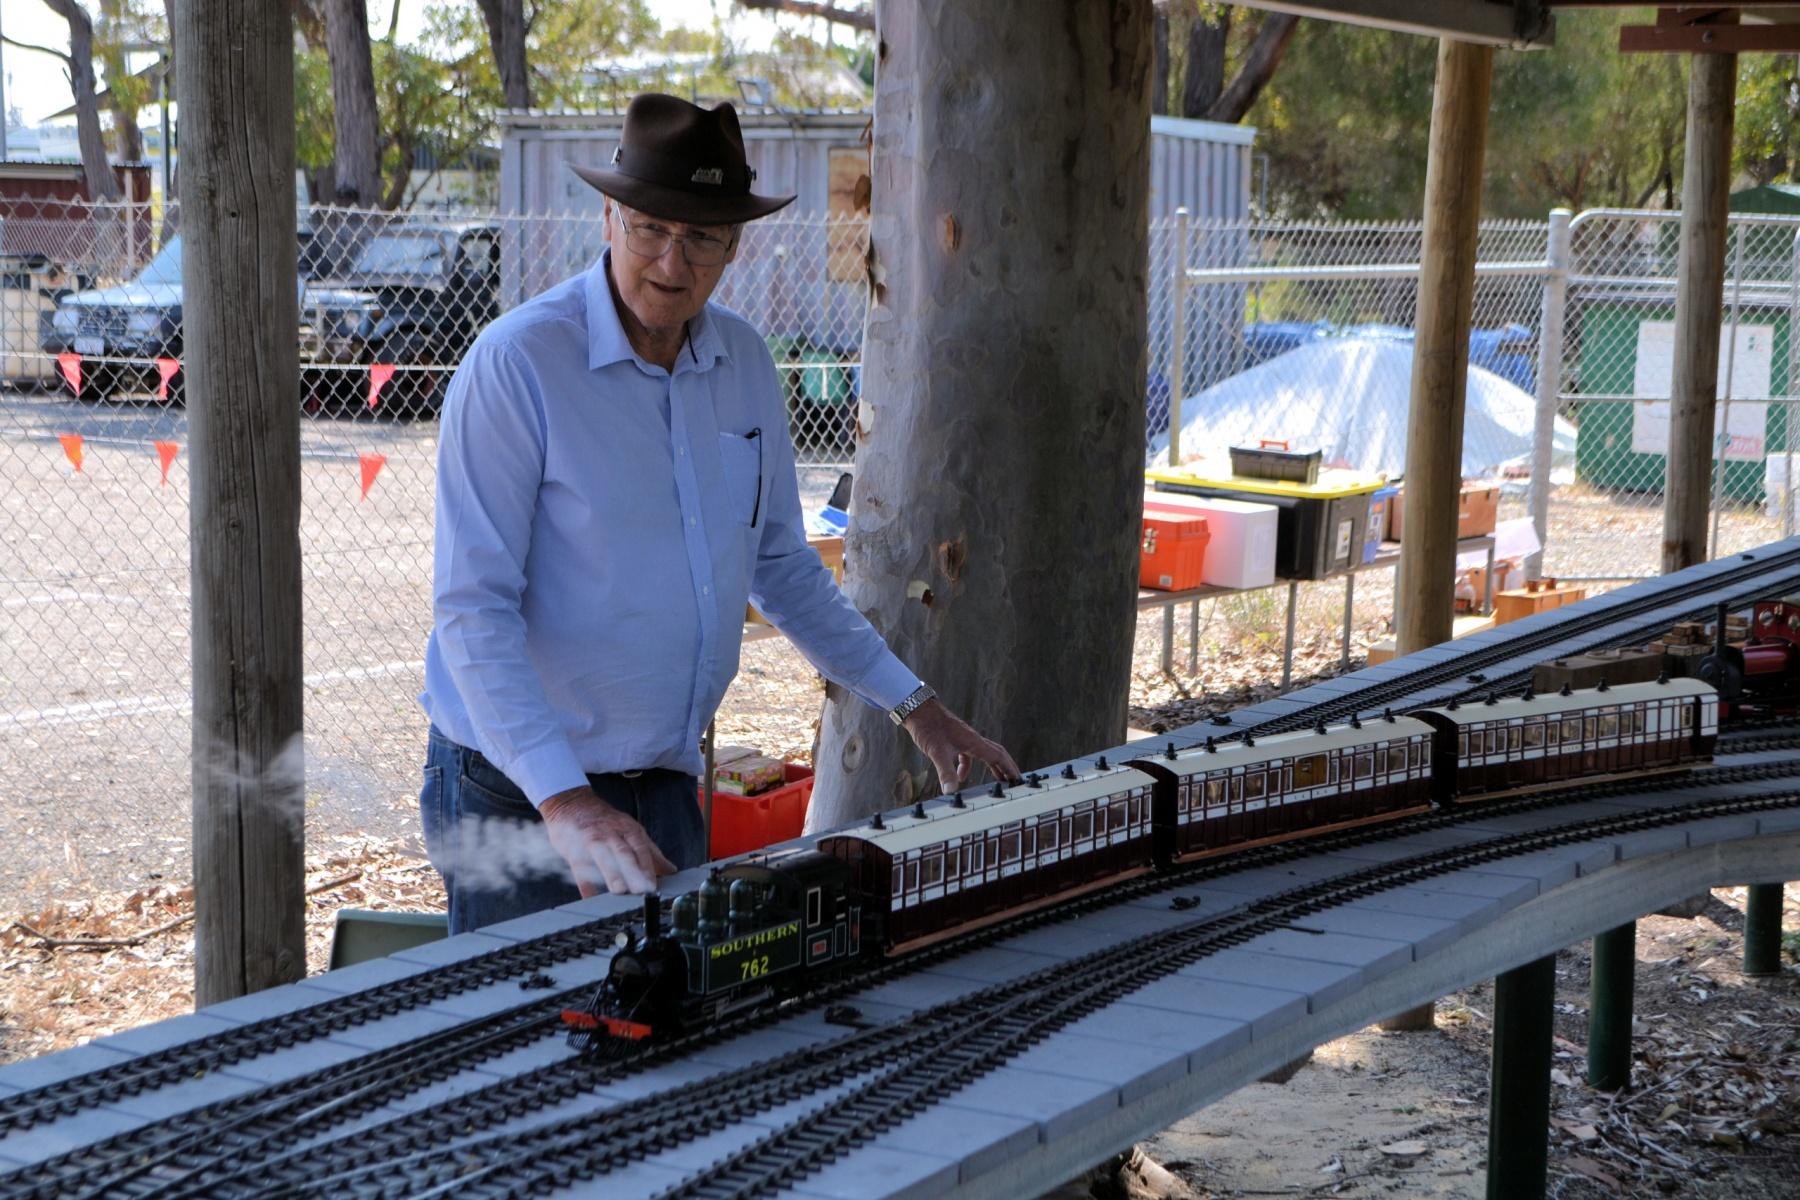 Laurie Morgan prepares the train